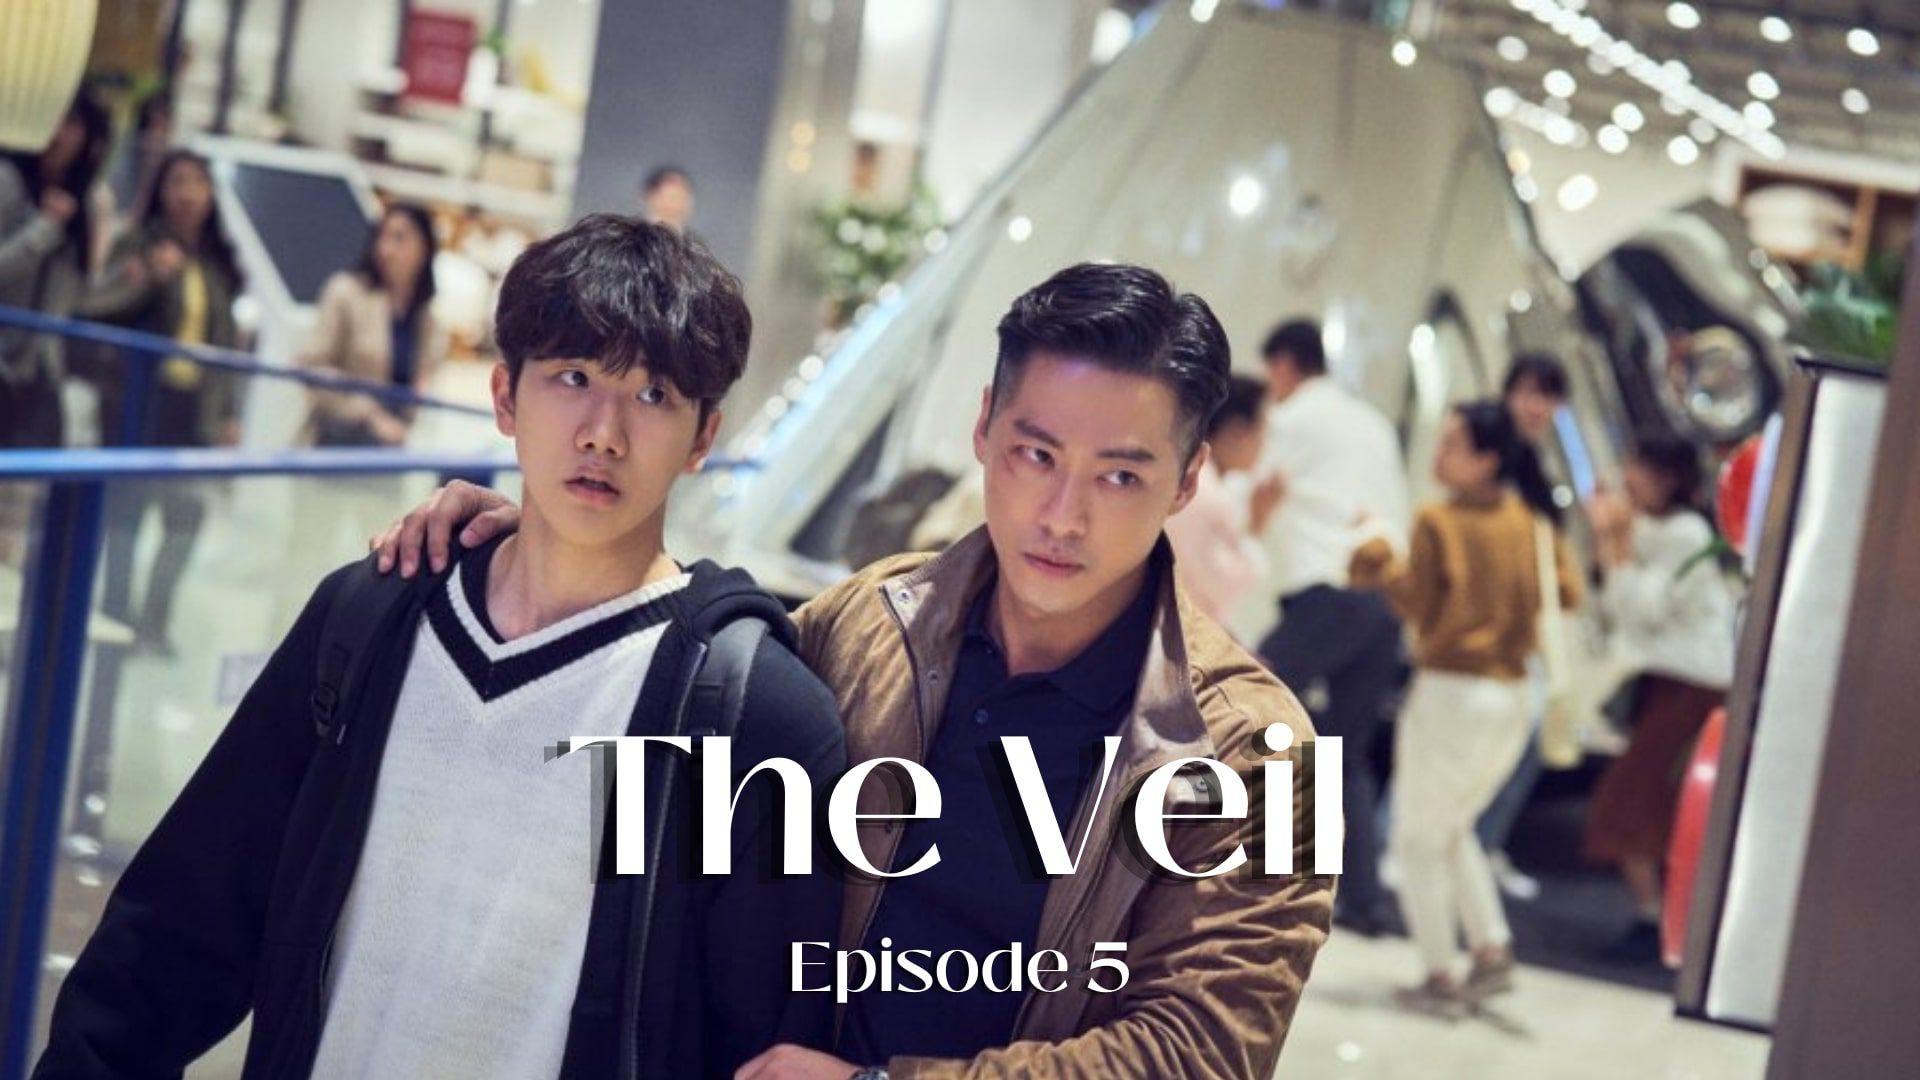 The Veil Episode 5